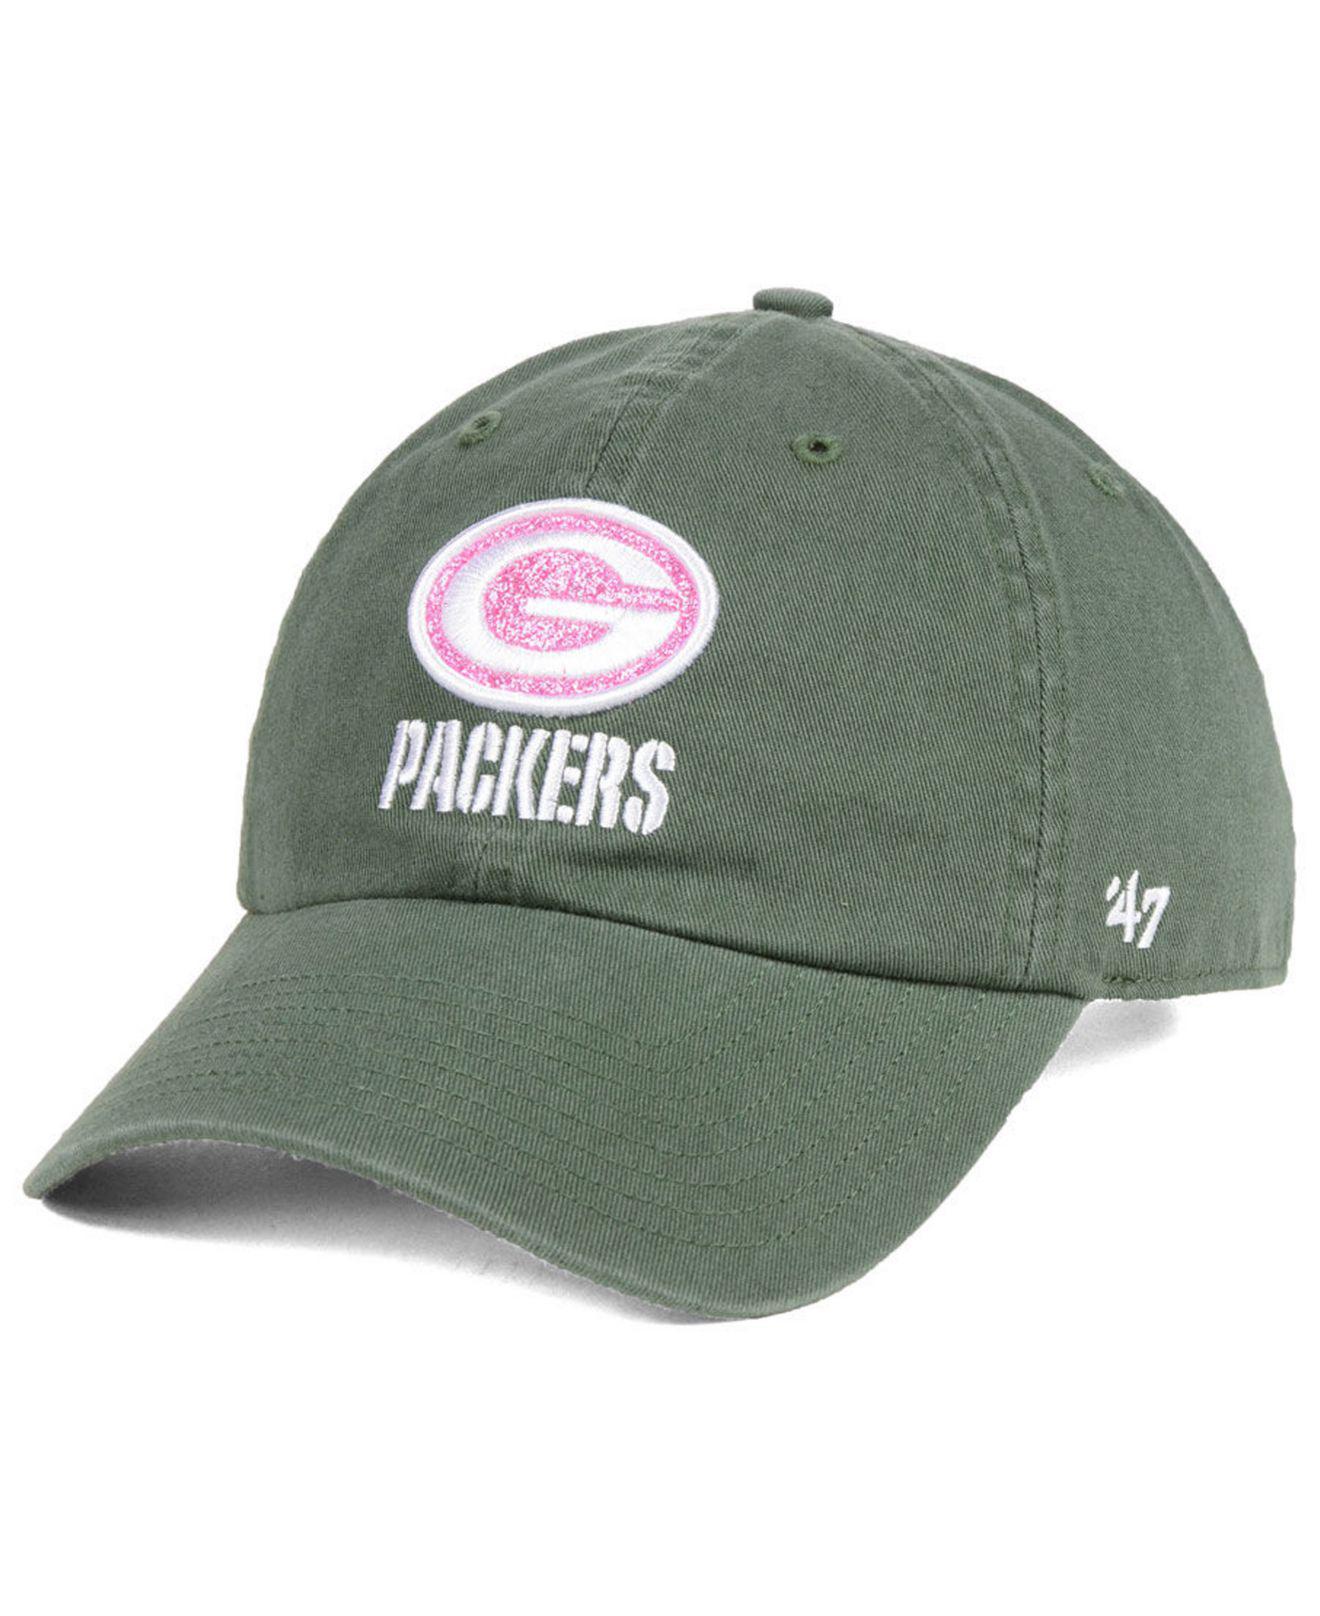 7bd7cf50b7831 ... adjustable hat ec82f 1619b  best 47 brand. womens green bay packers  moss glitta clean up cap ff97e f8191